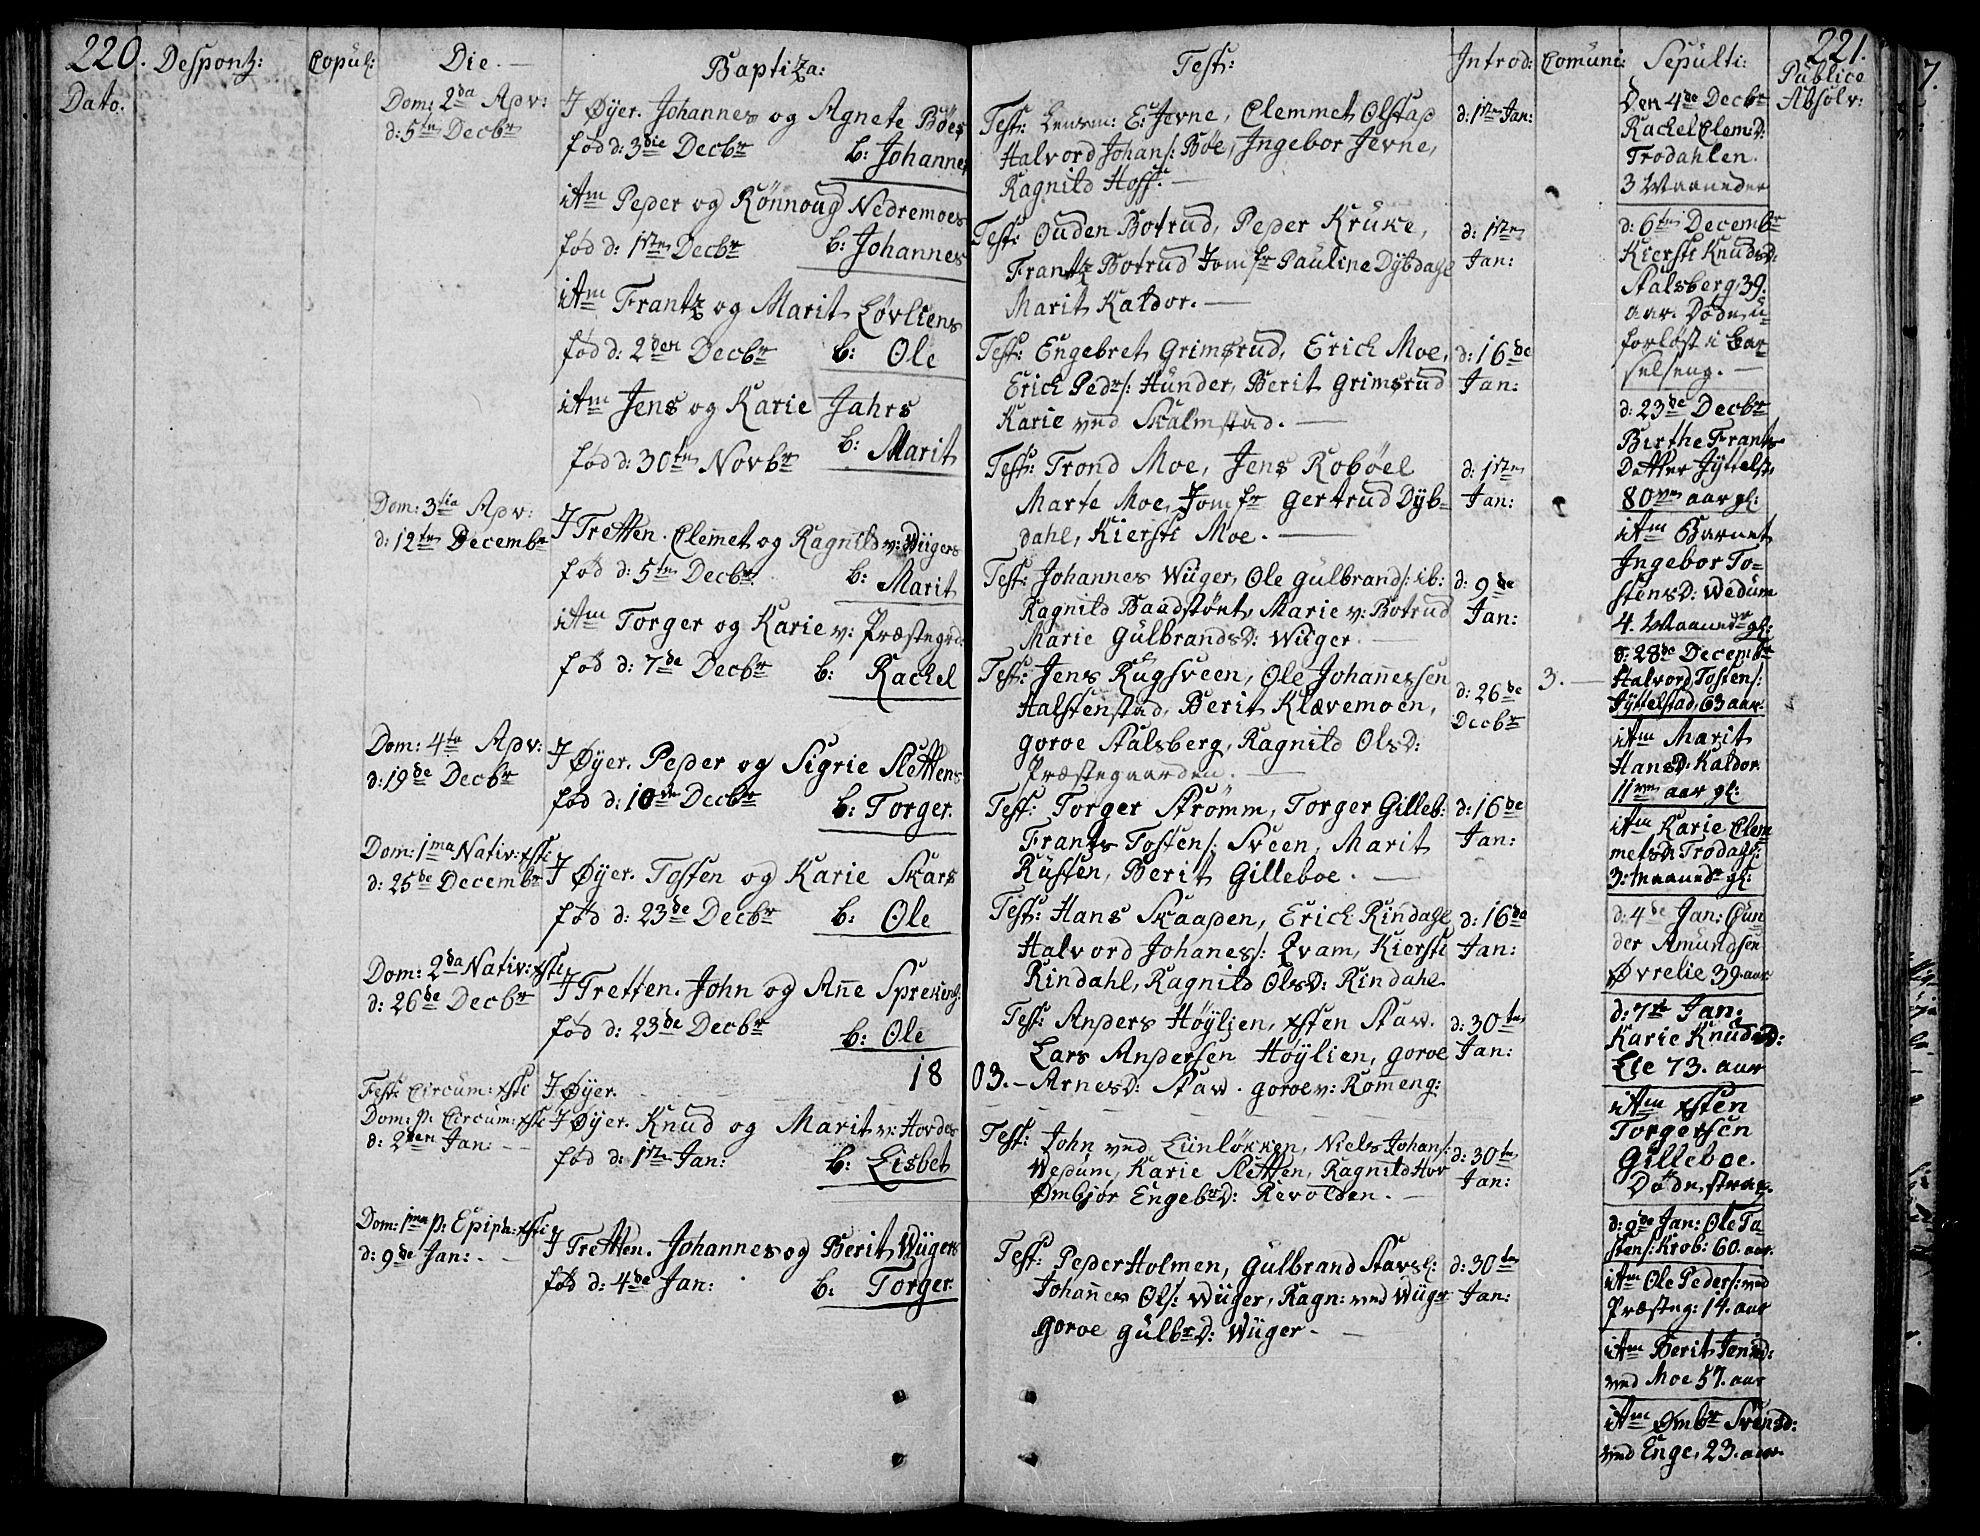 SAH, Øyer prestekontor, Ministerialbok nr. 3, 1784-1824, s. 220-221